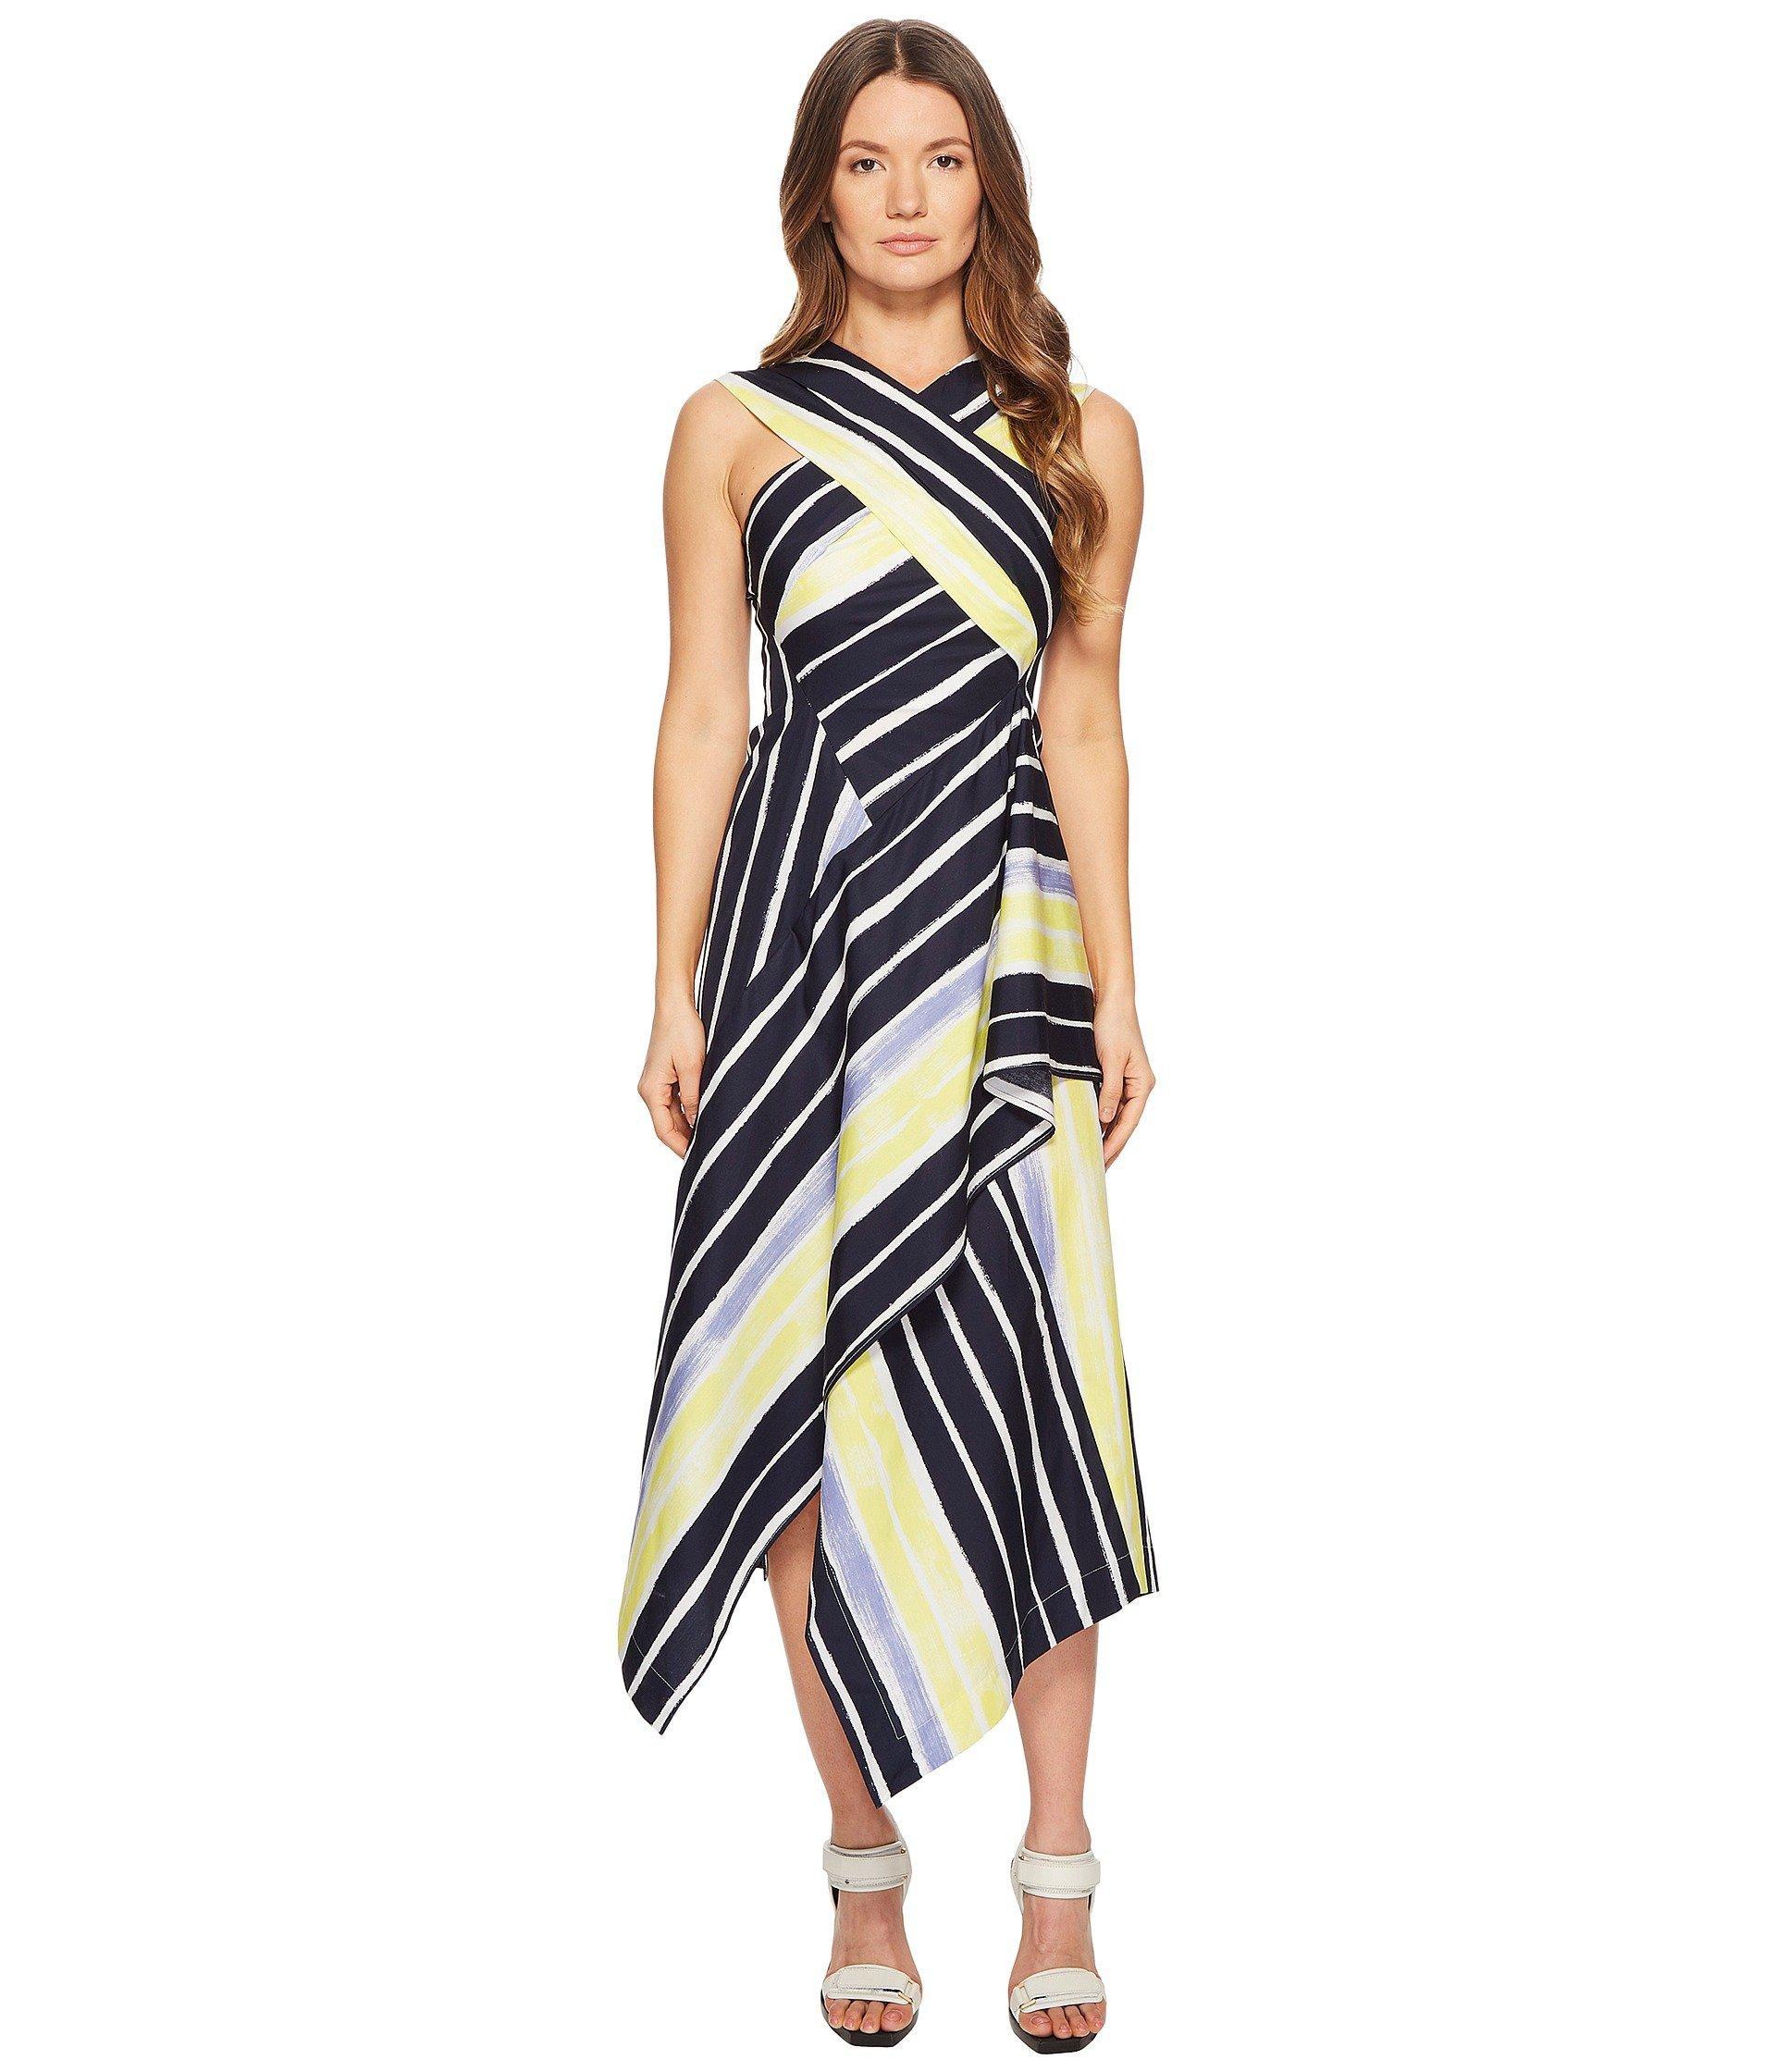 f202a8def4 Sportmax - Blue Cles Striped Wrapped Sleeveless Dress - Lyst. View  fullscreen